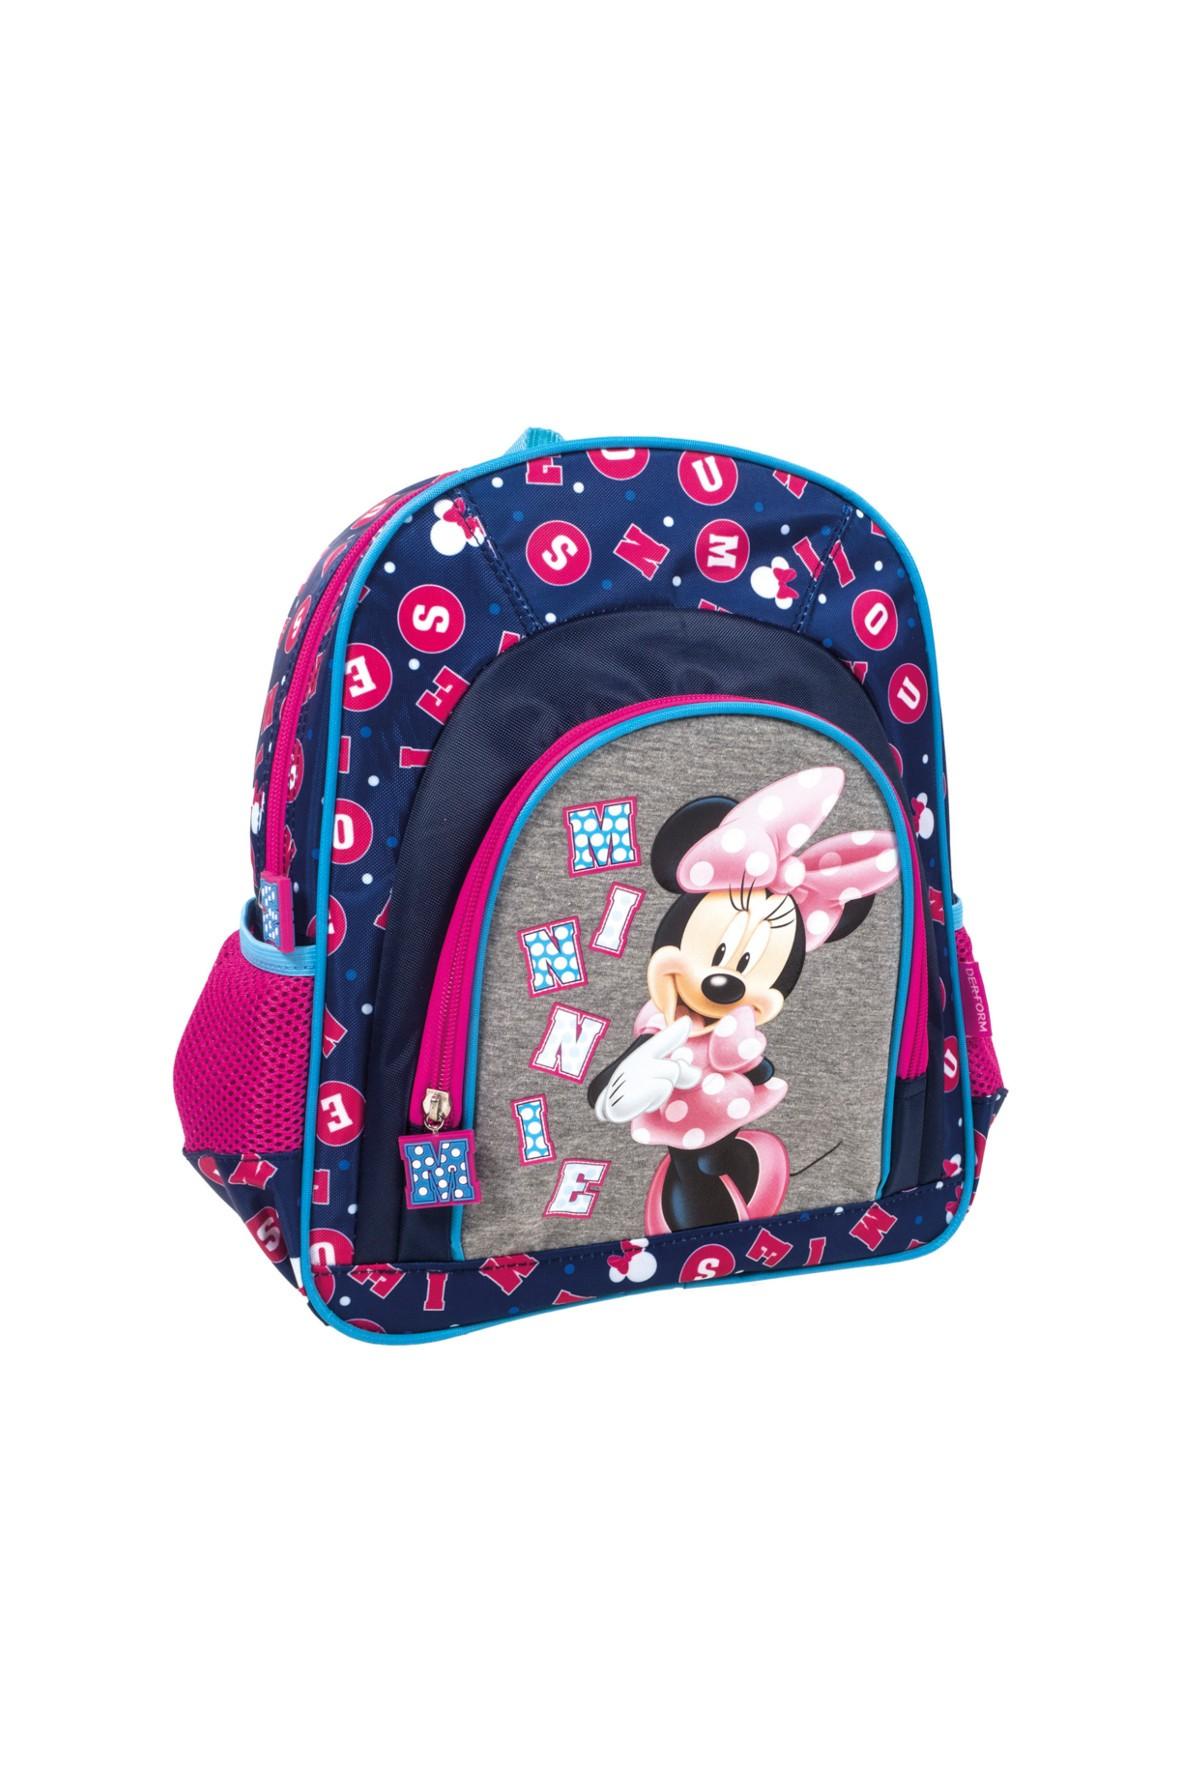 Plecak szkolny Myszka Minnie